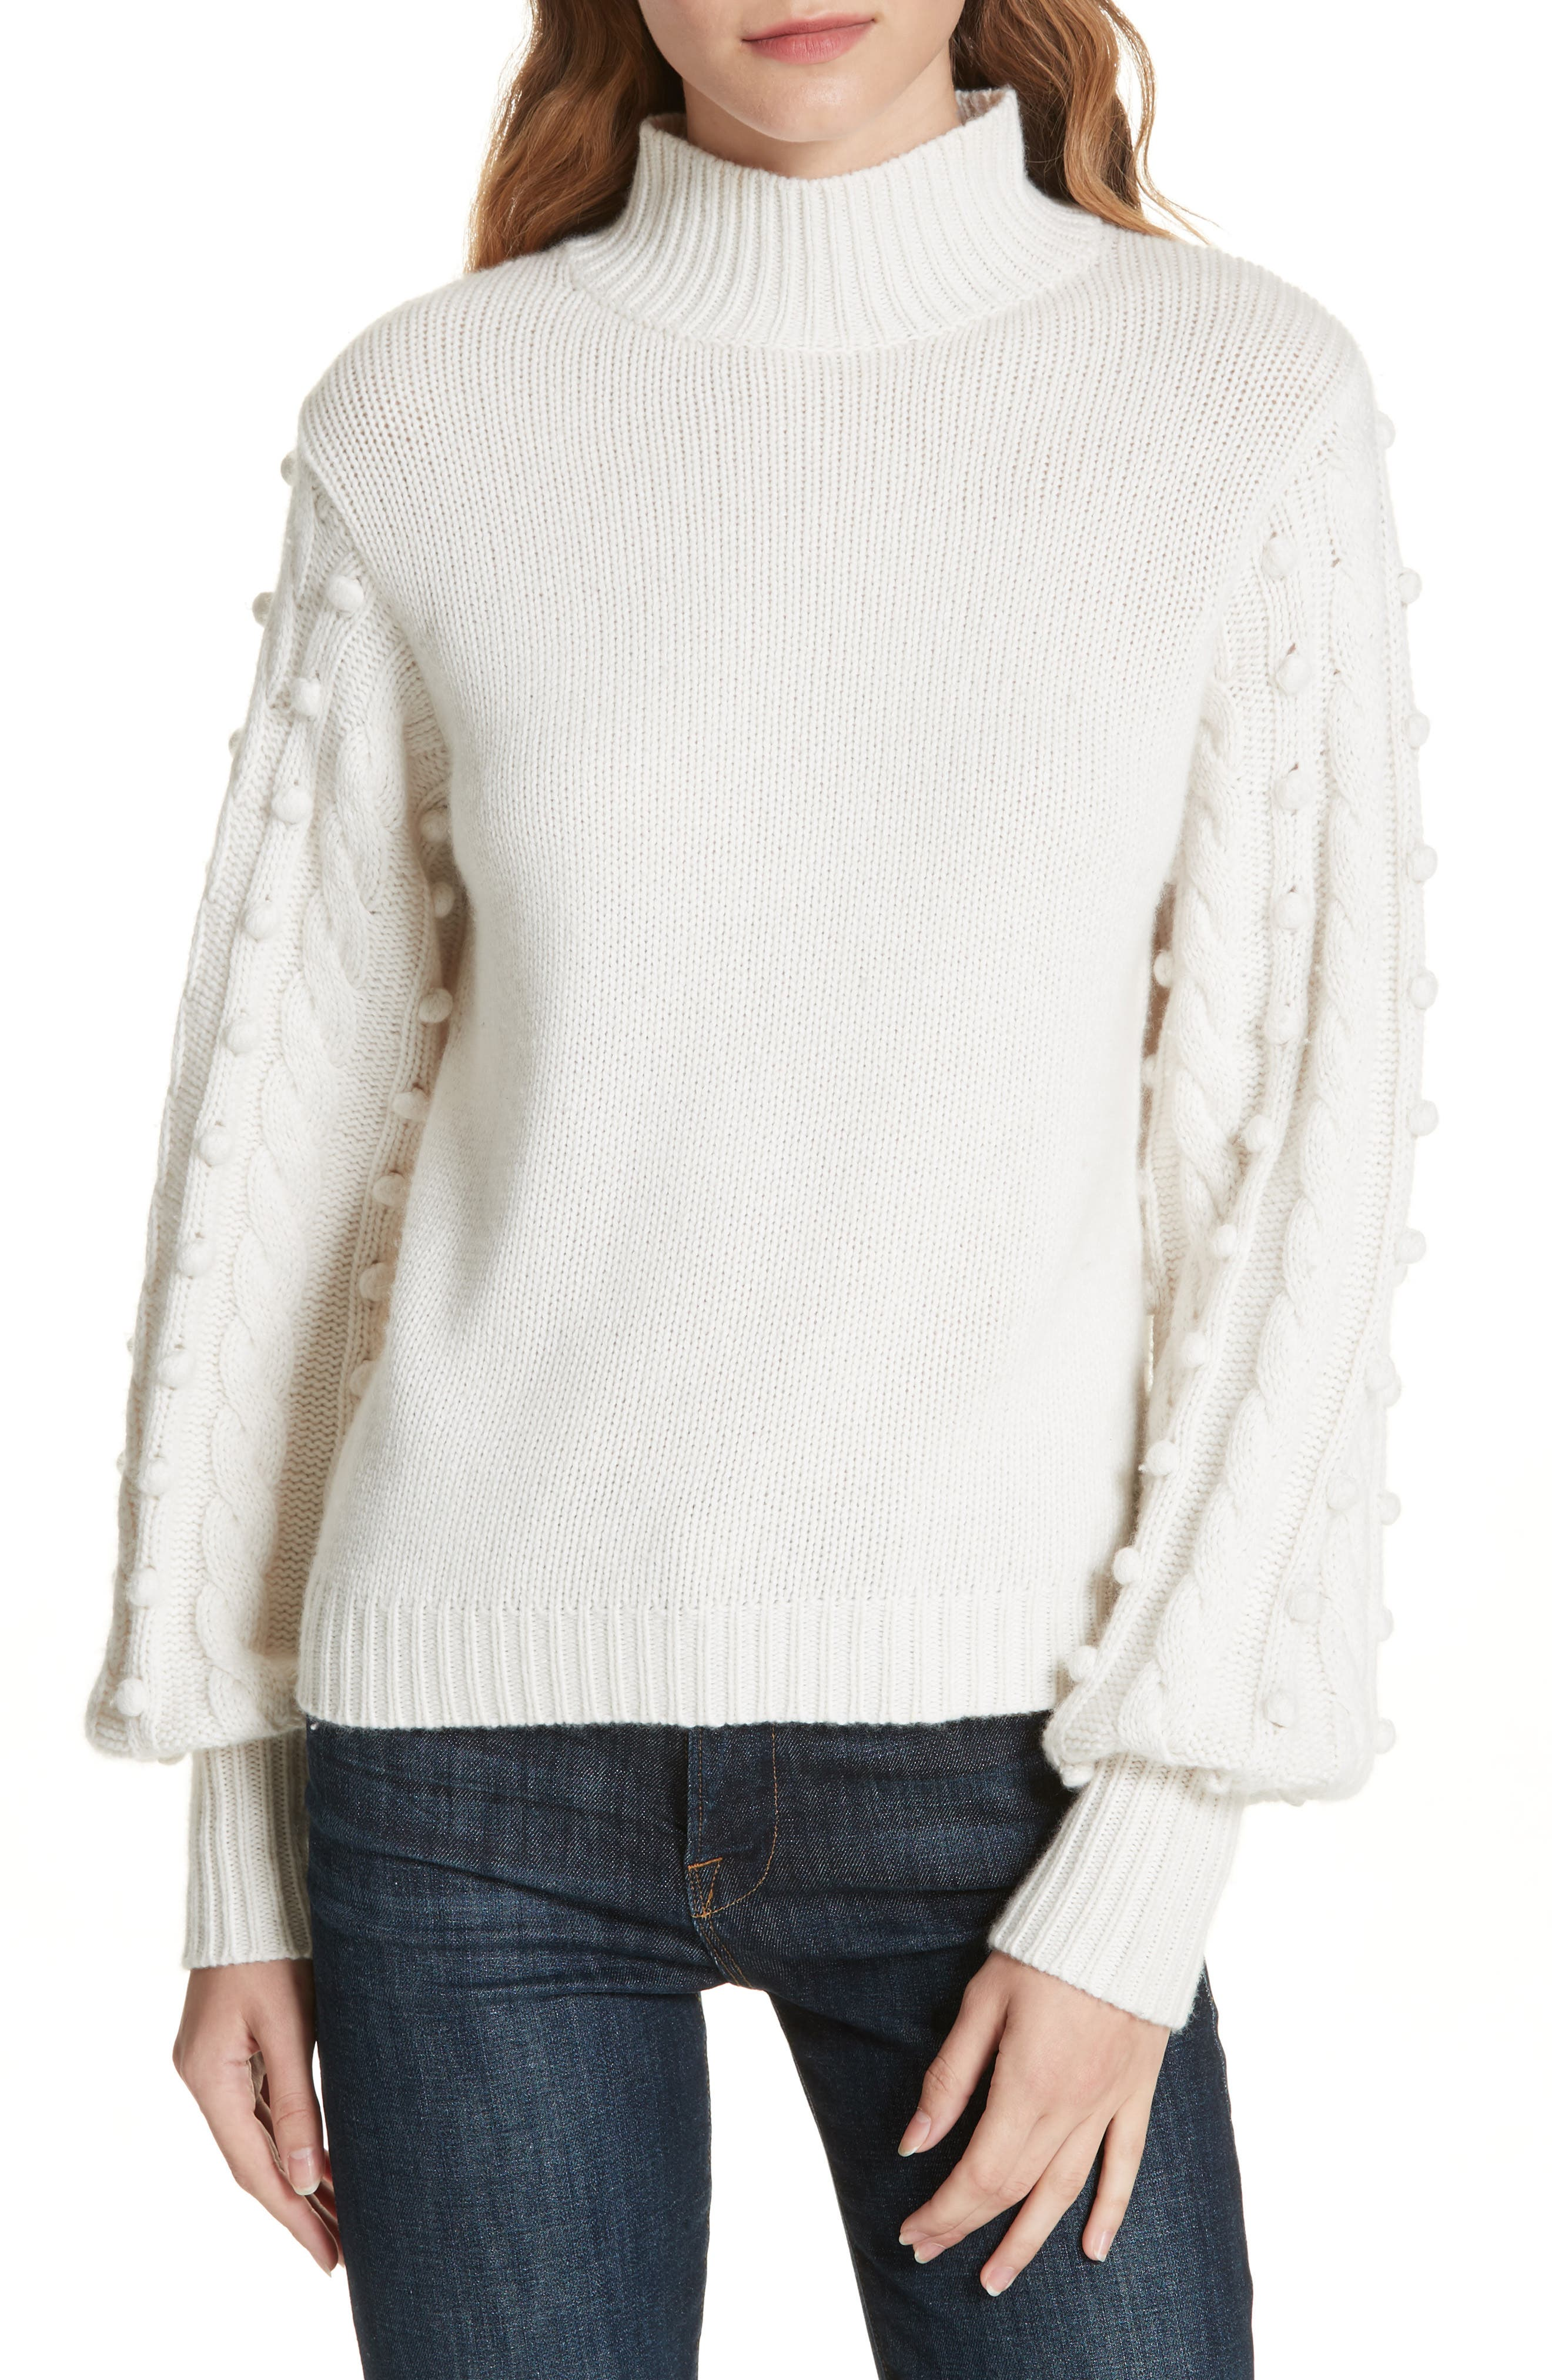 Autumn Cashmere Popcorn Sleeve Cashmere & Wool Blend Sweater, Ivory